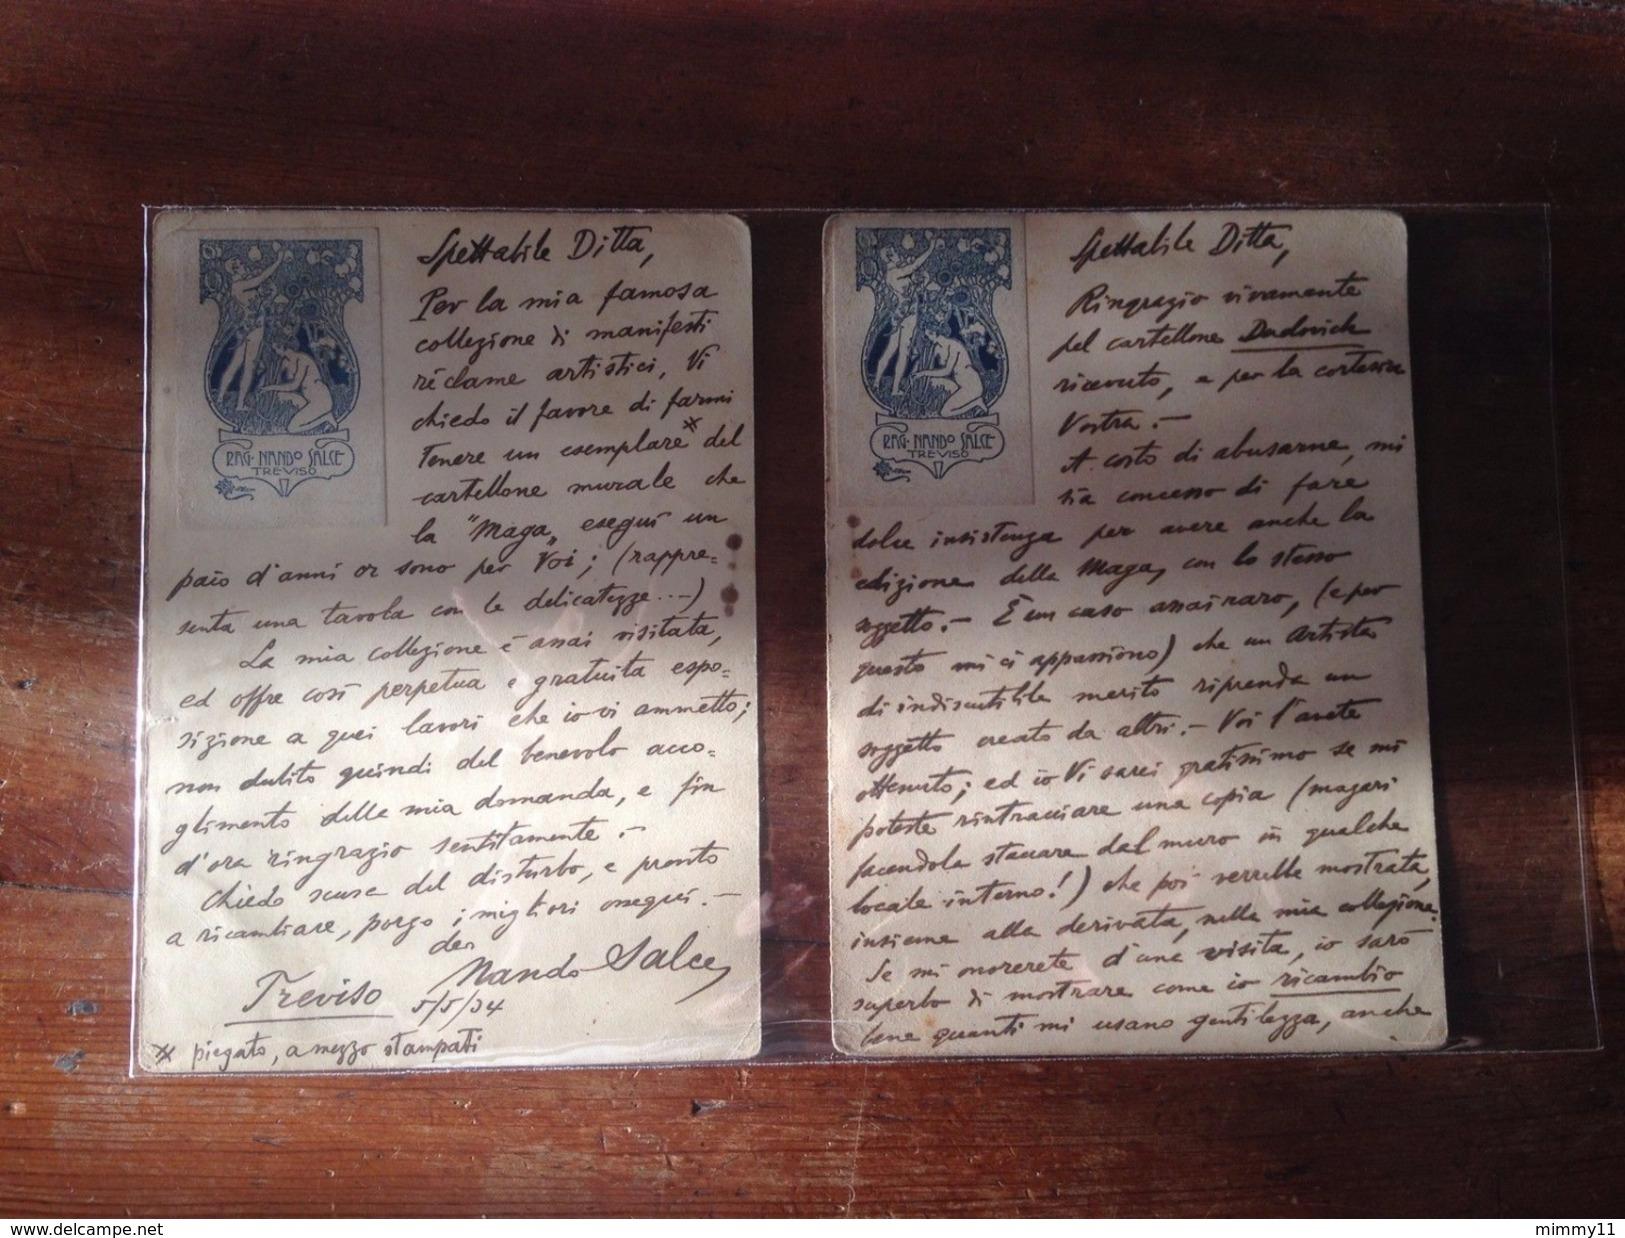 Cartoline/Firmate NANDO SALCE+Erinnofili/Prot/Motta-'34-Richiesta Manifesti RRR - Treviso